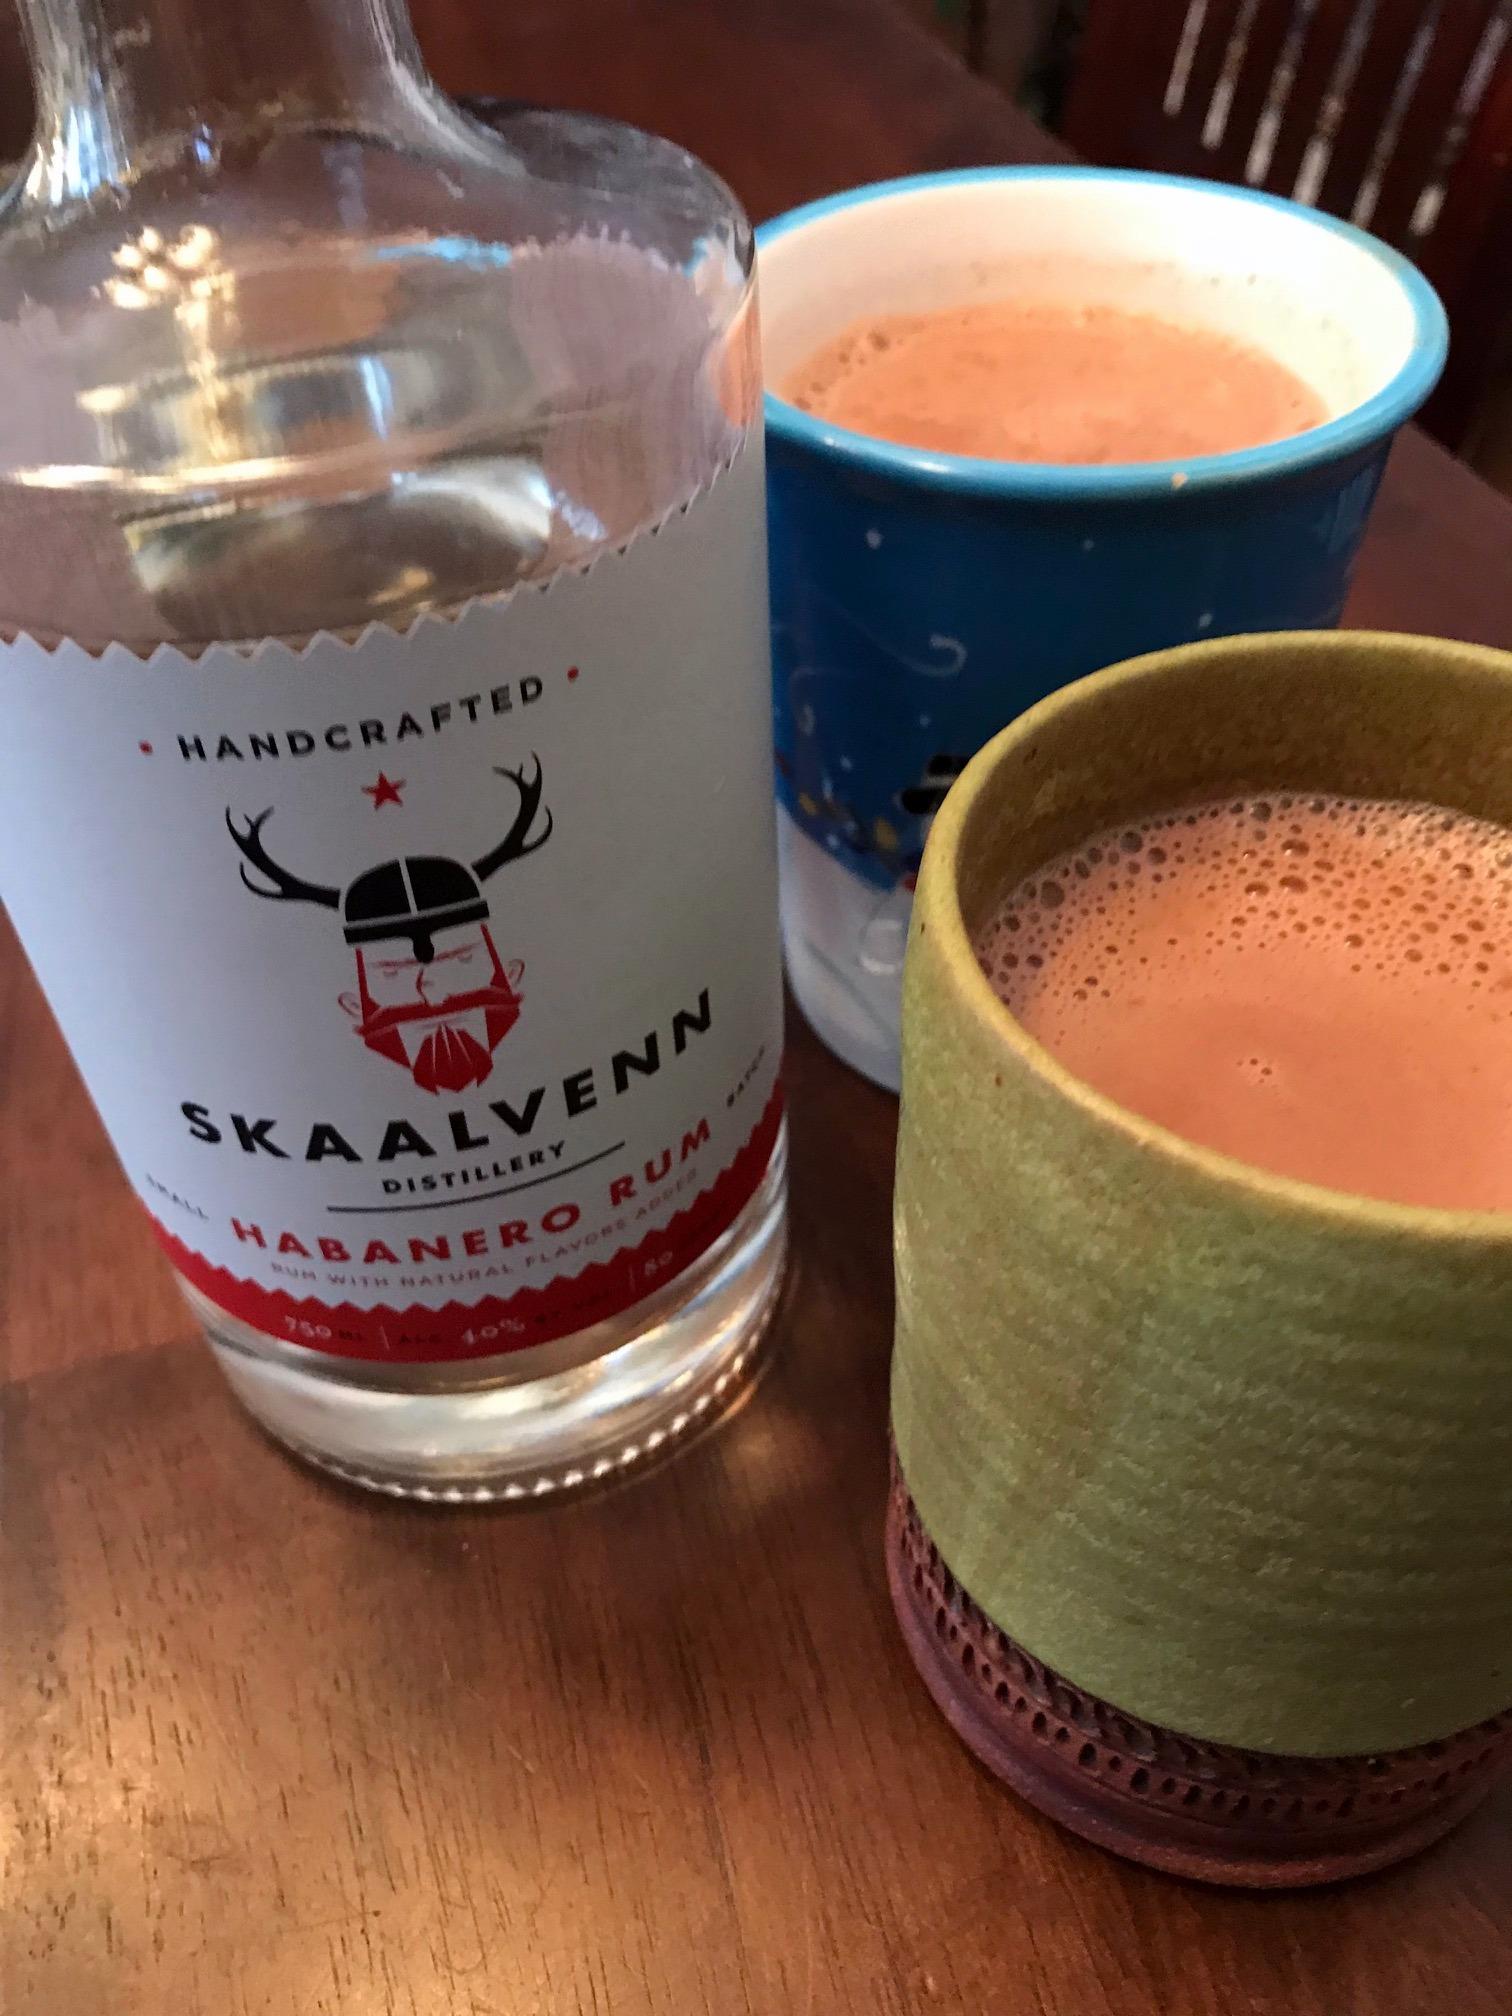 Skaalvenn Habanero Rum is great in hot chocolate!